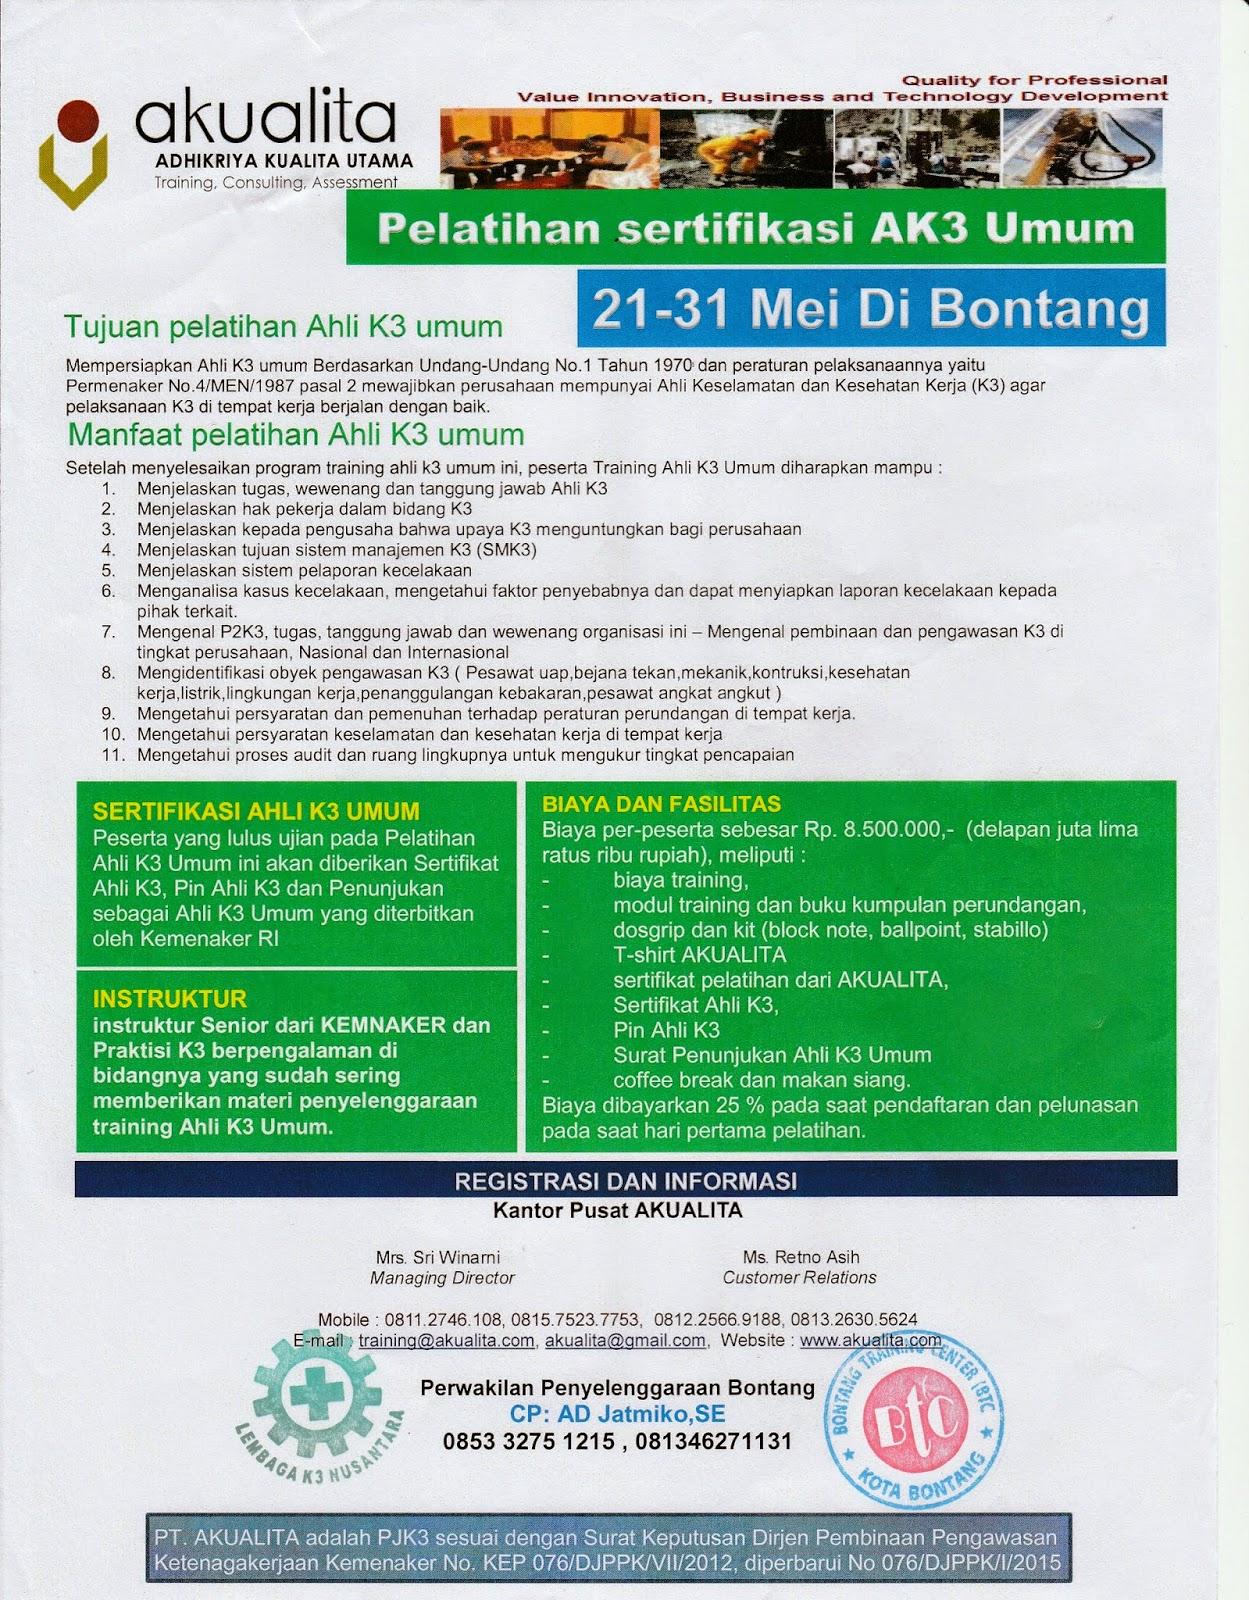 Informasi Pelatihan Akualita Sertifikasi AK3 Umum